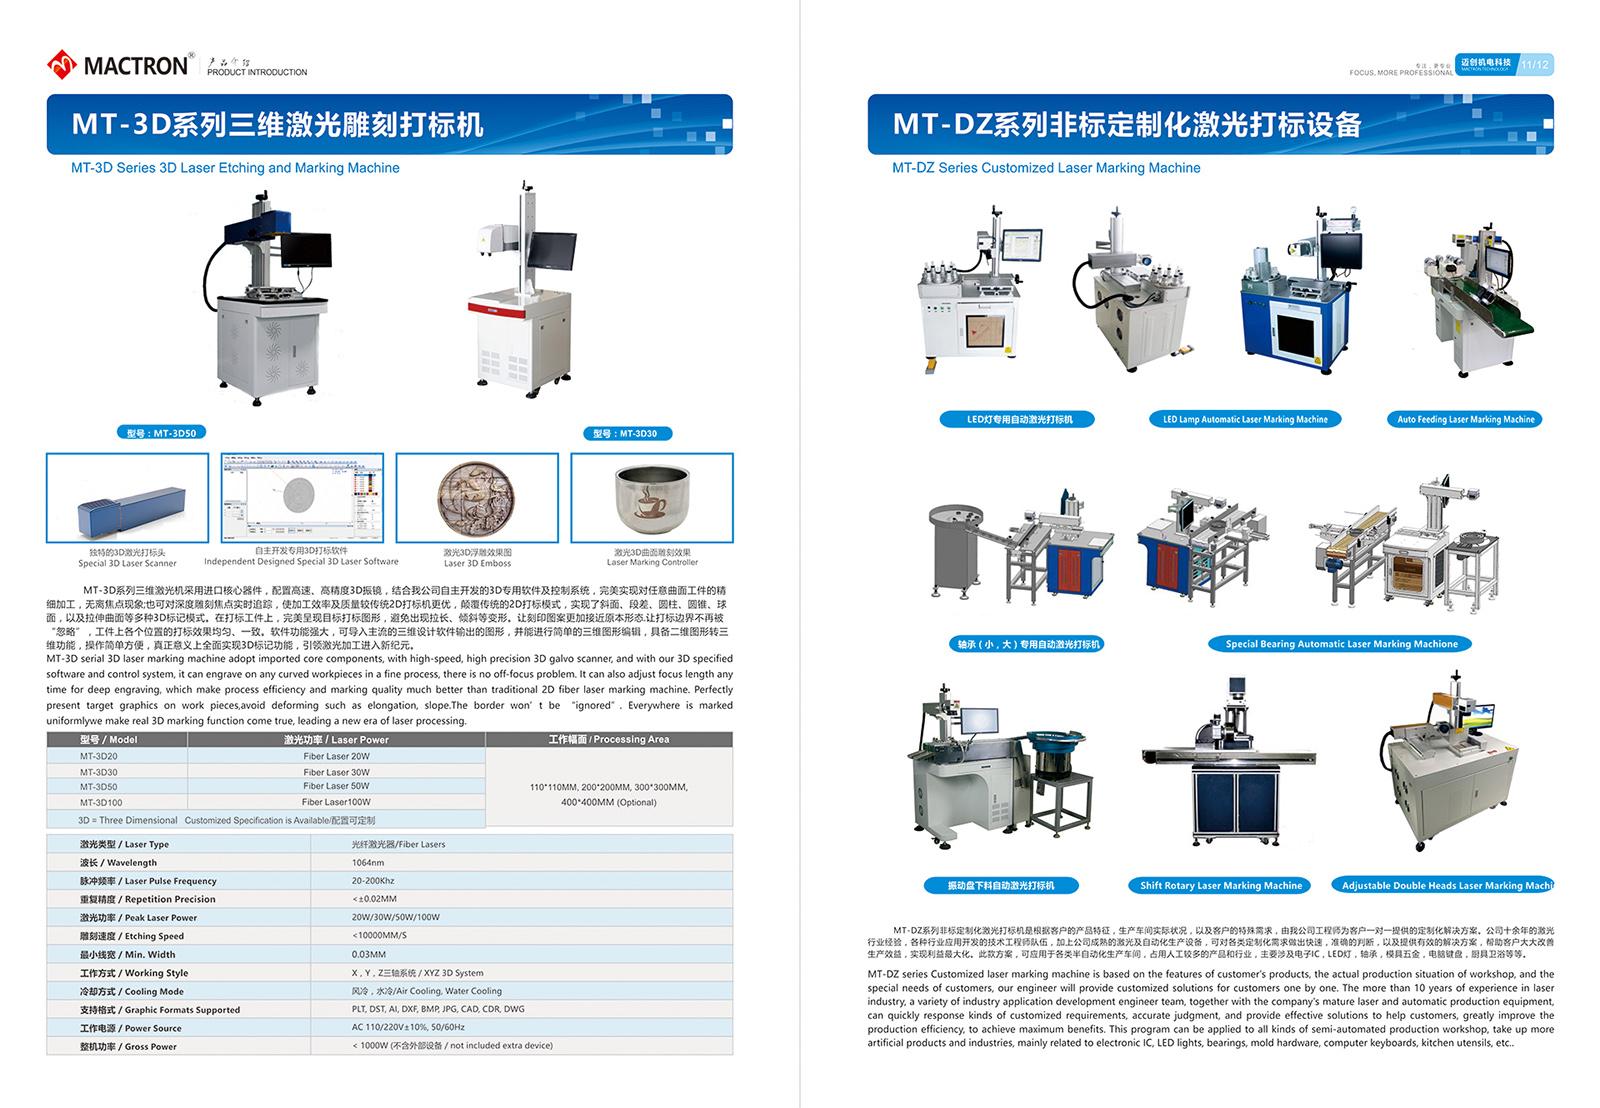 Mactron Tech Laser Catalogue 2017 (7)